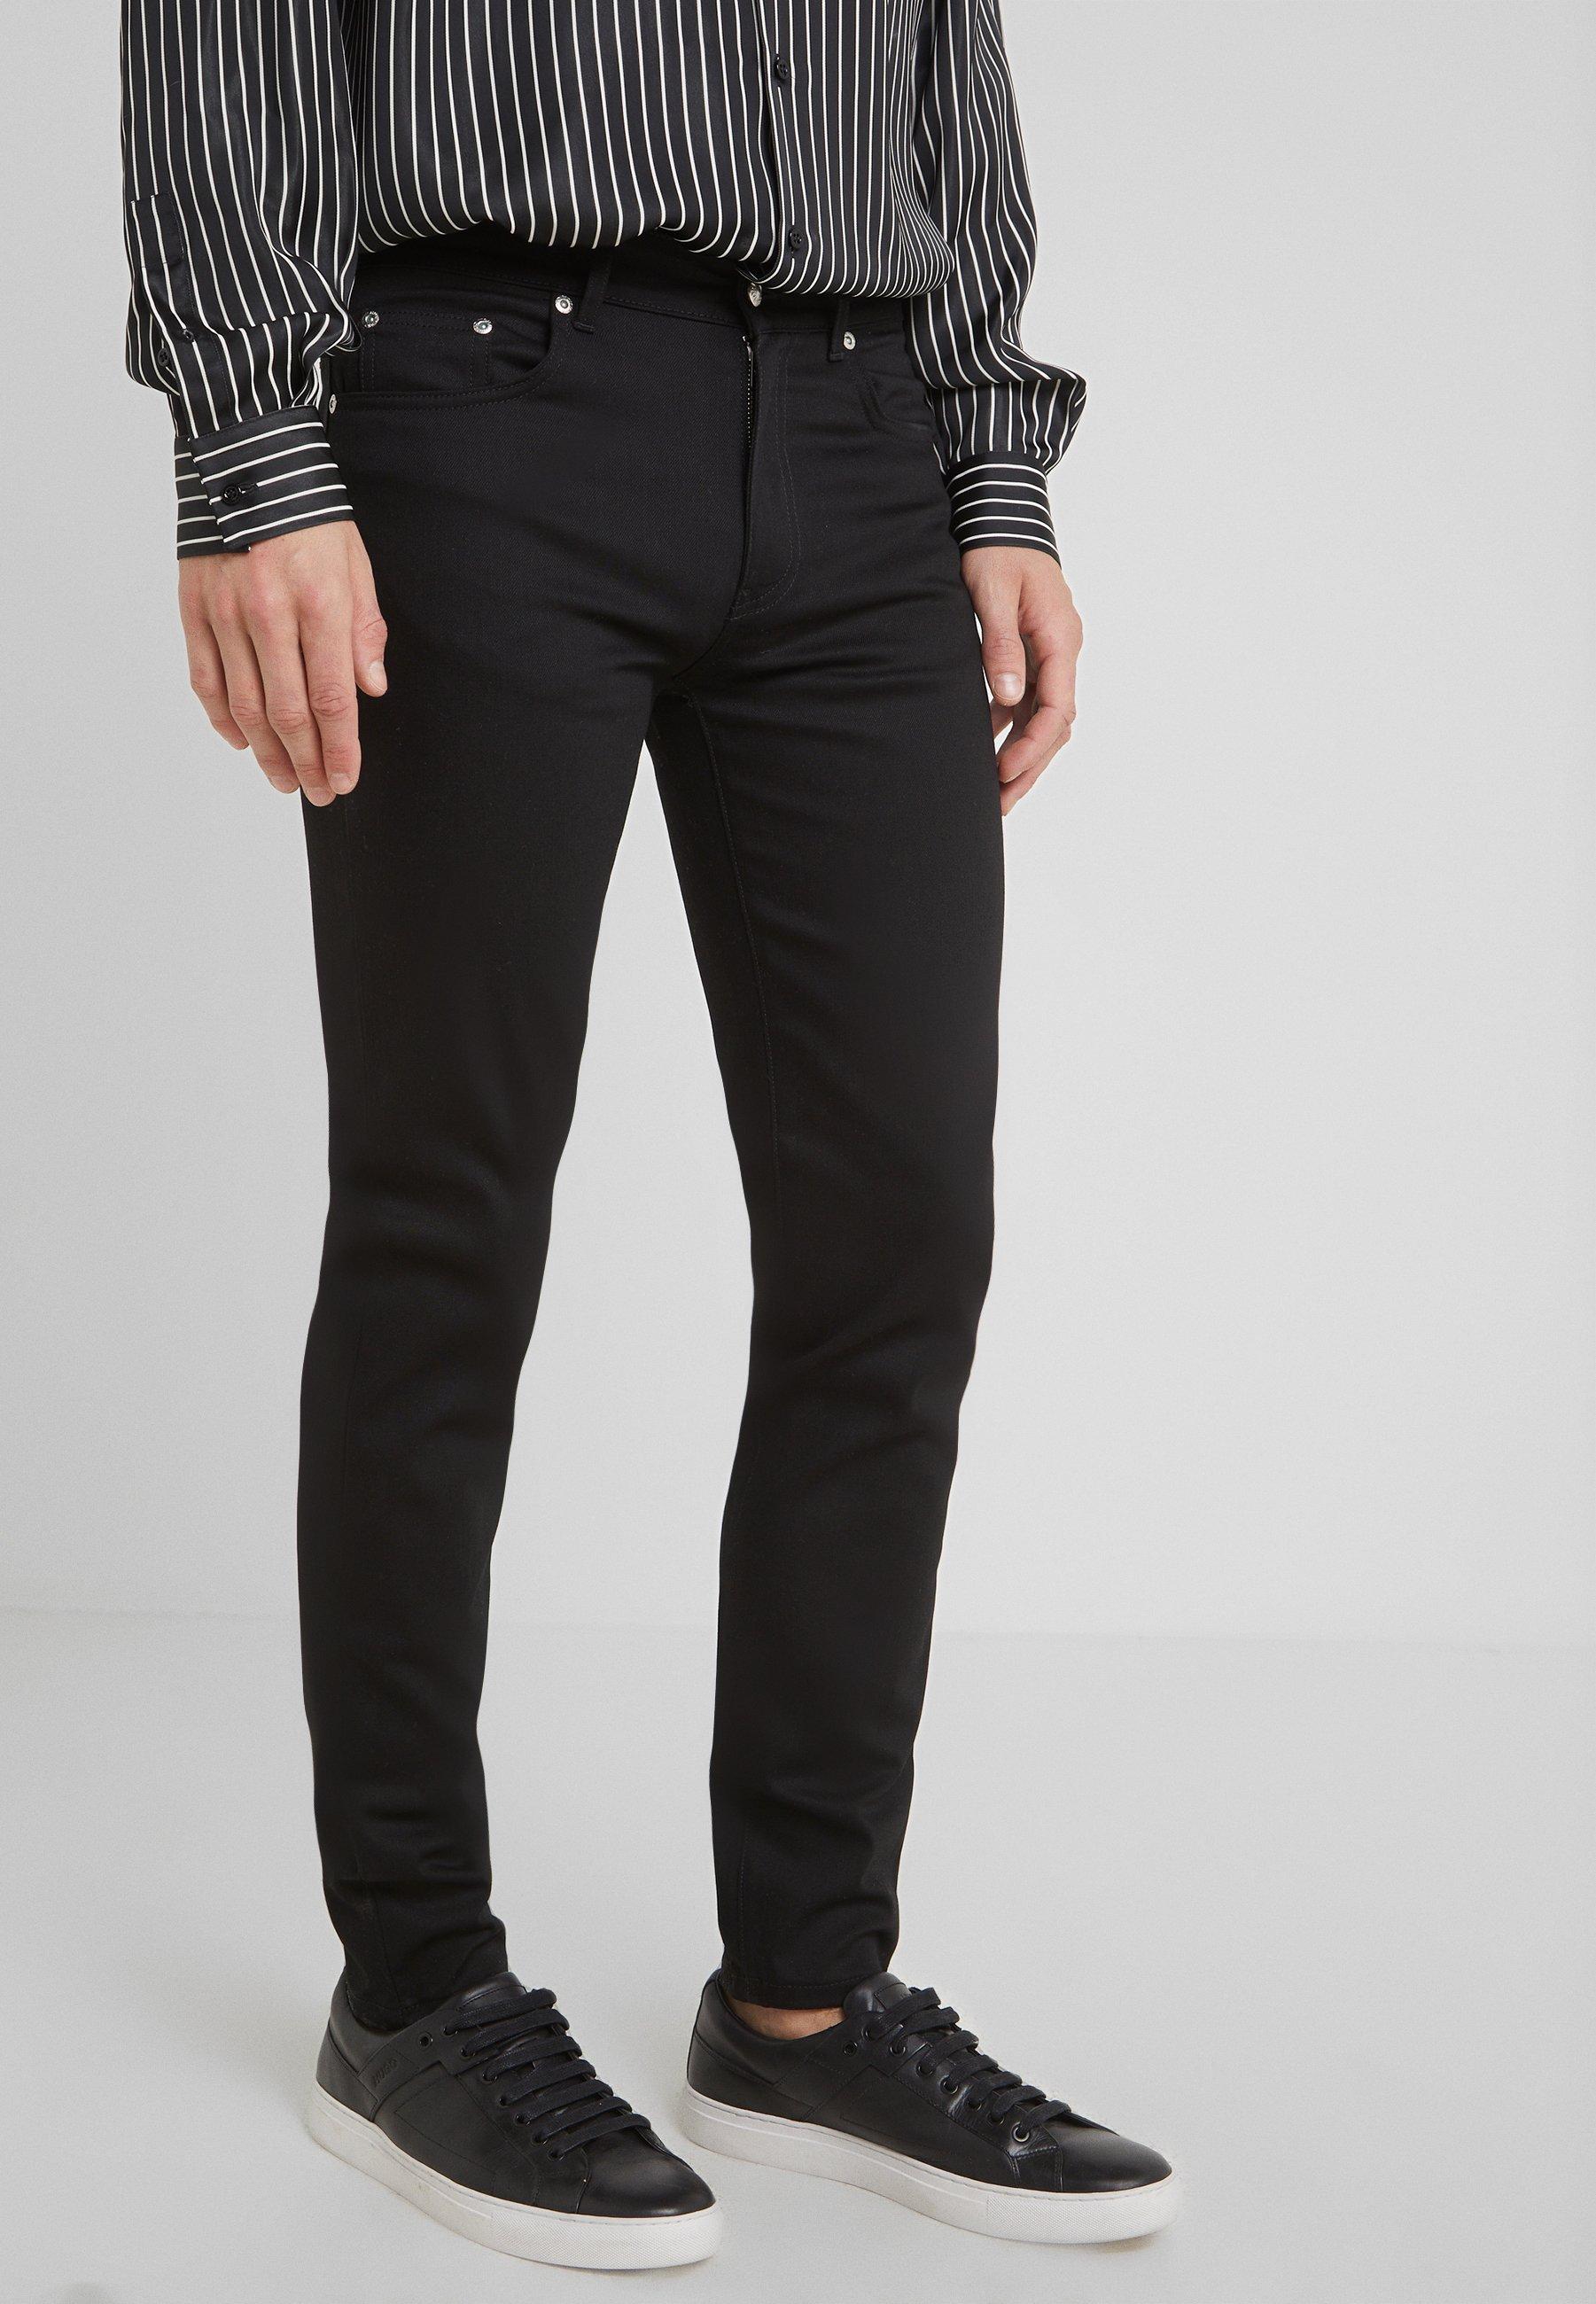 Uomo DEAN NEW - Jeans slim fit